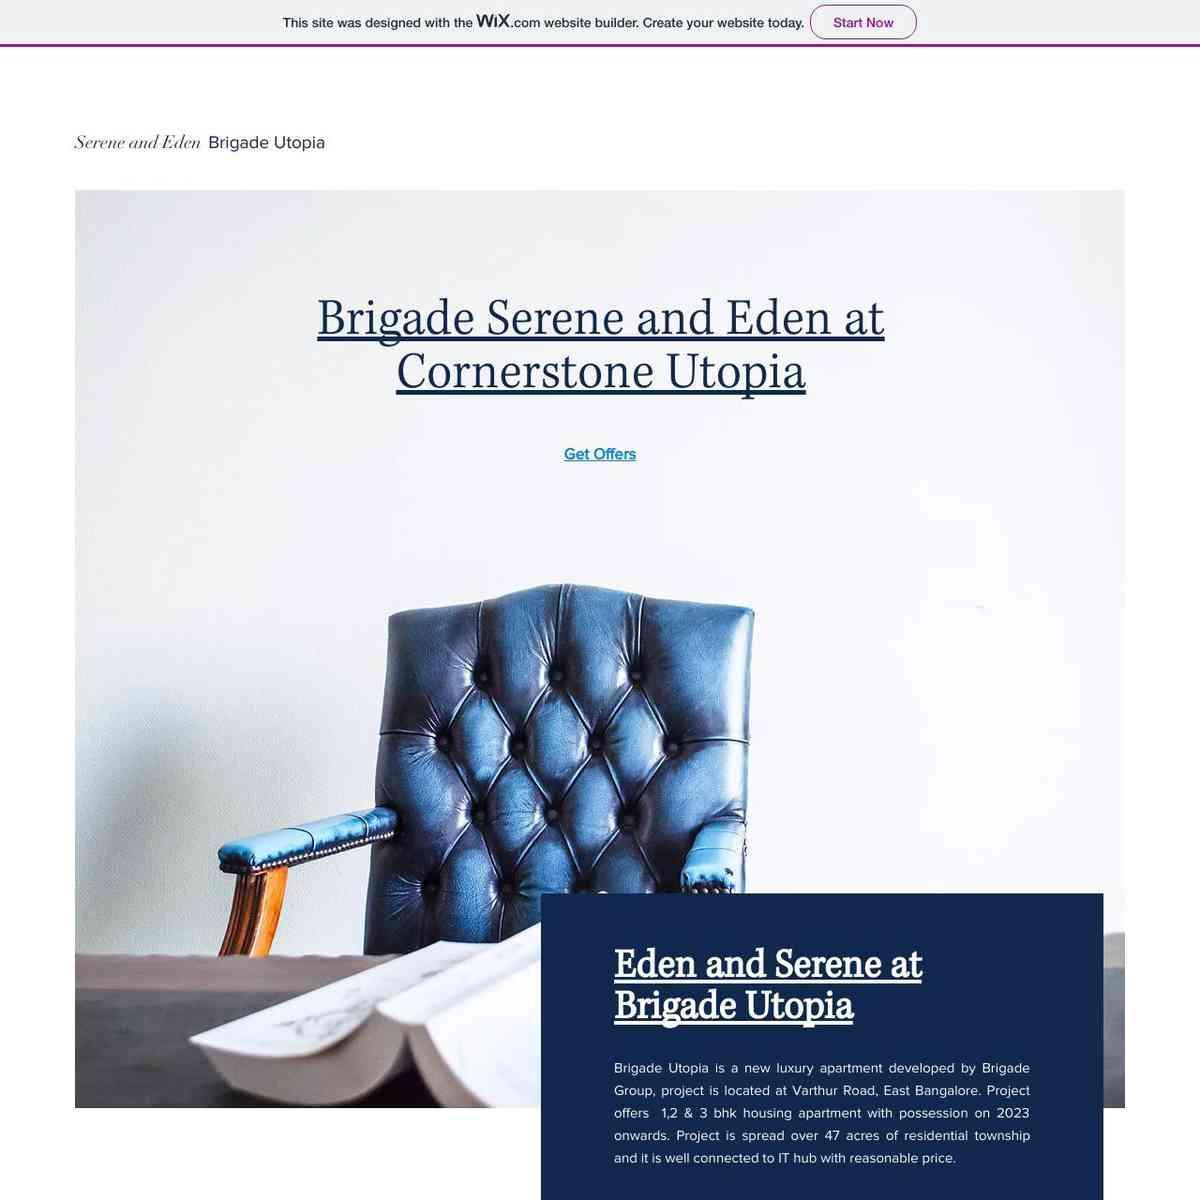 Eden and Serene at Brigade Cornerstone Utopia